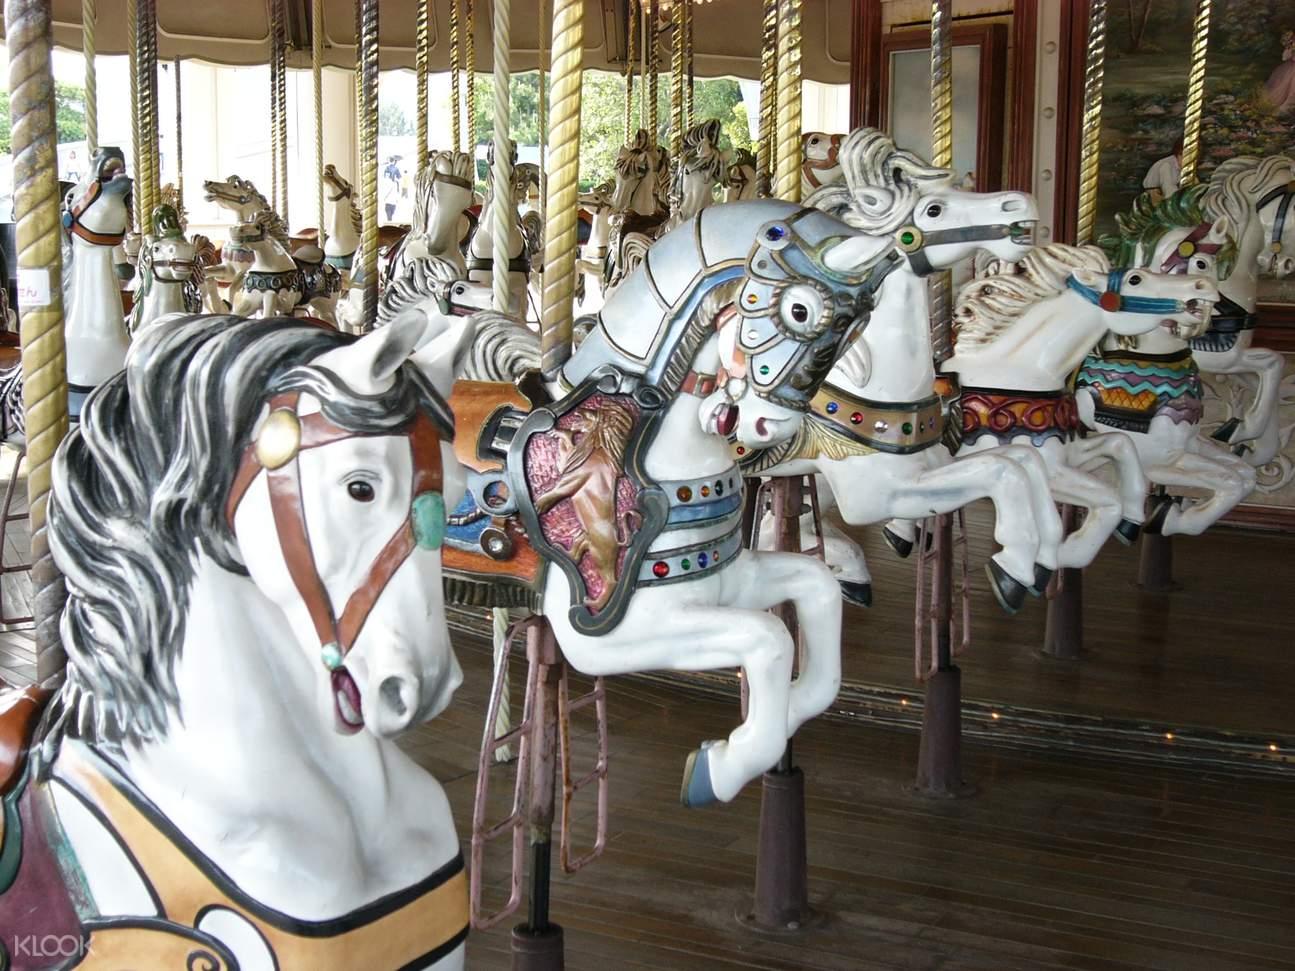 Yokohama Hakkeijima Sea Paradise merry go round